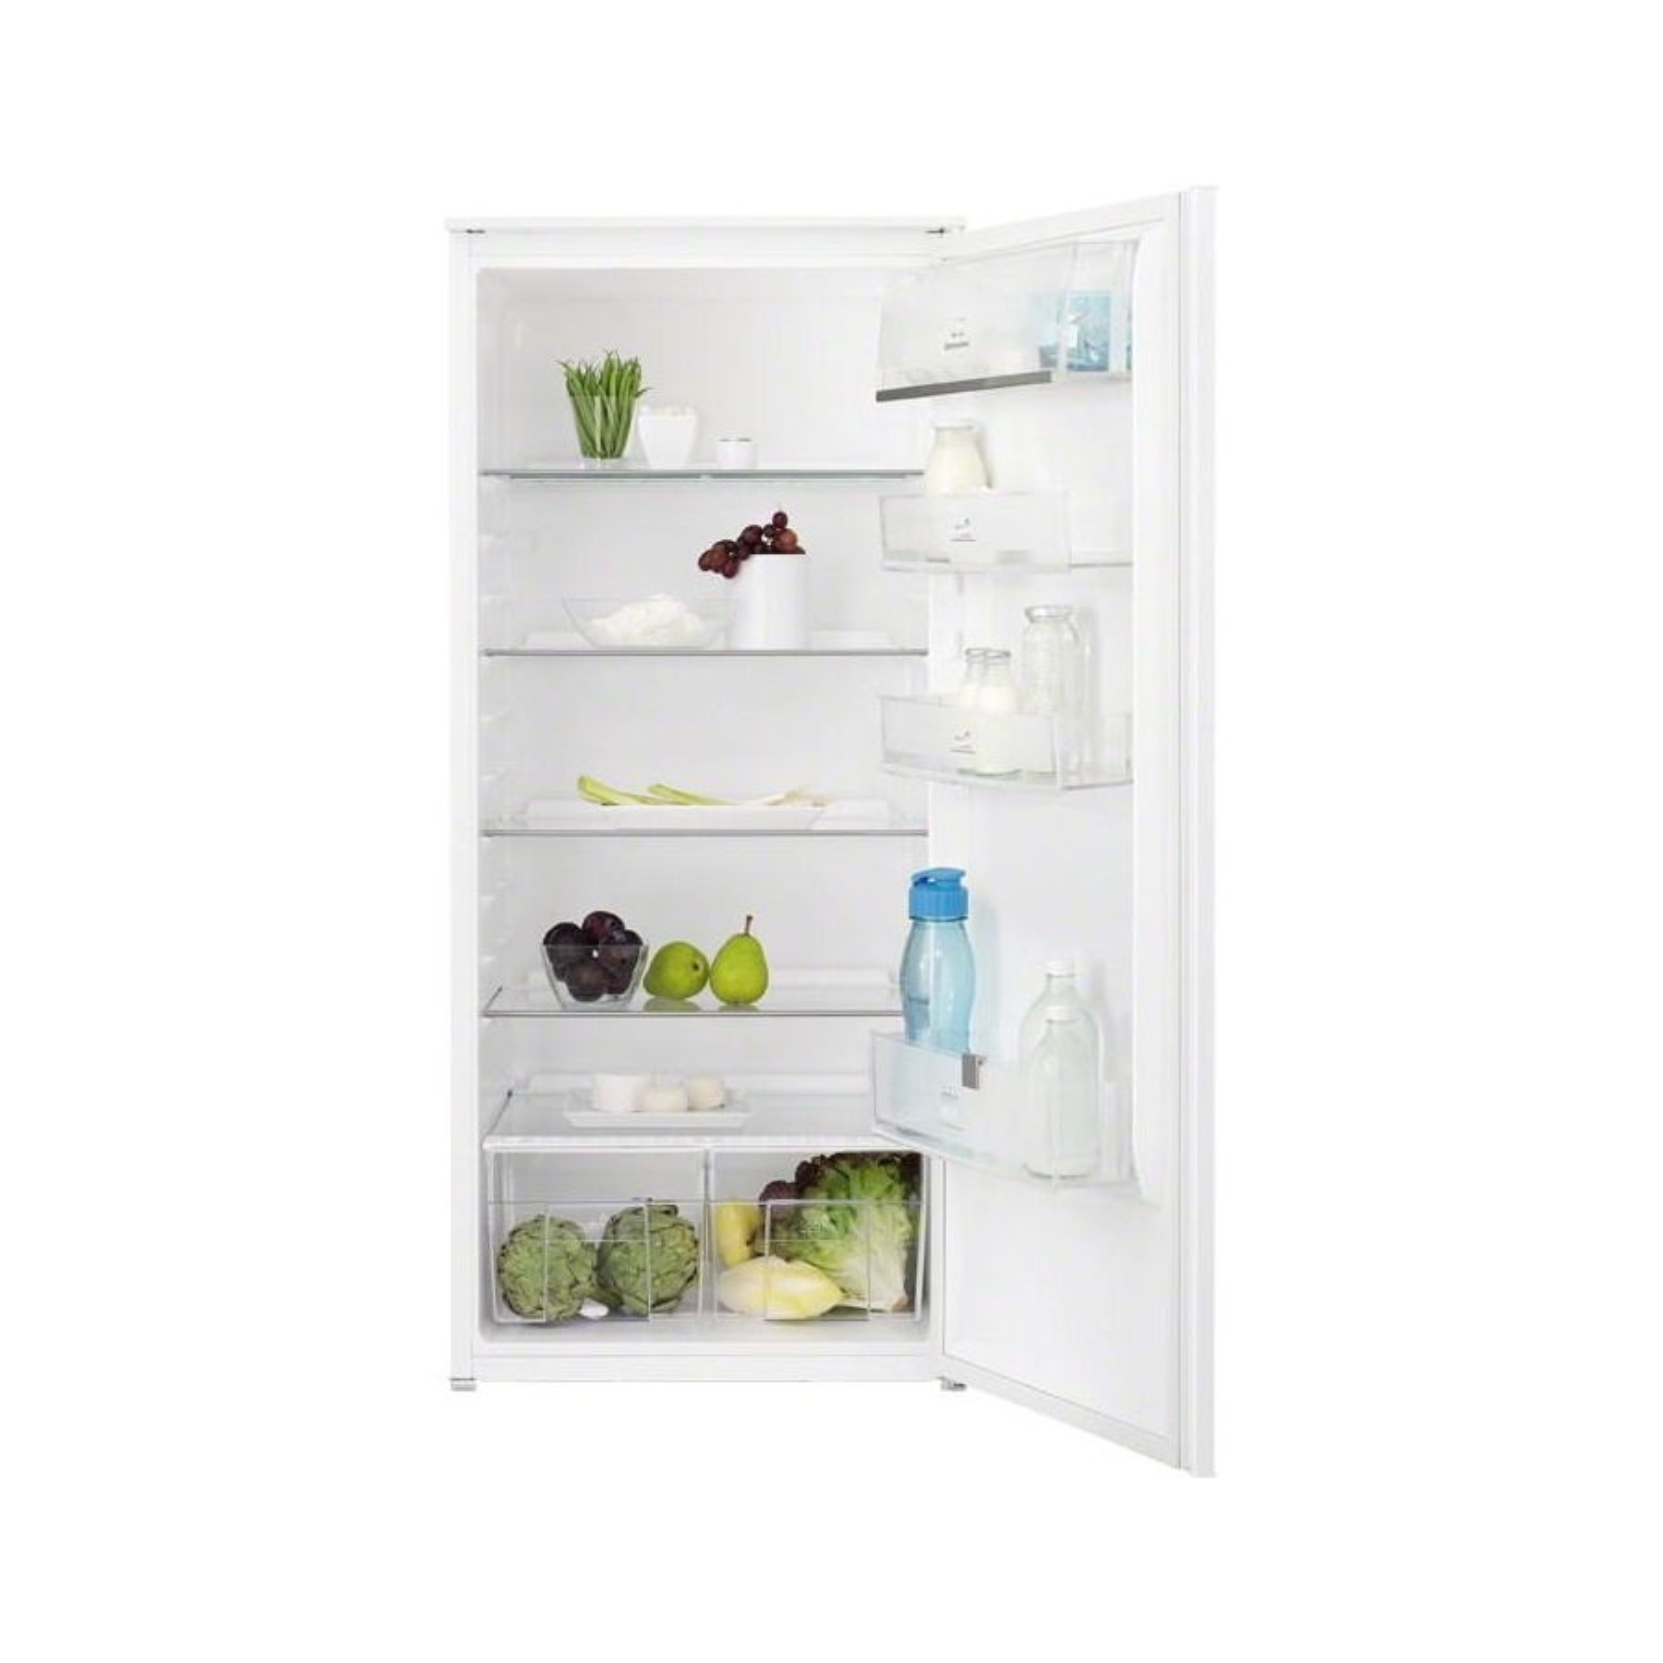 frigorifero da incasso rex electrolux ern2301aow monoporta 230 lt classe a elettrovillage. Black Bedroom Furniture Sets. Home Design Ideas